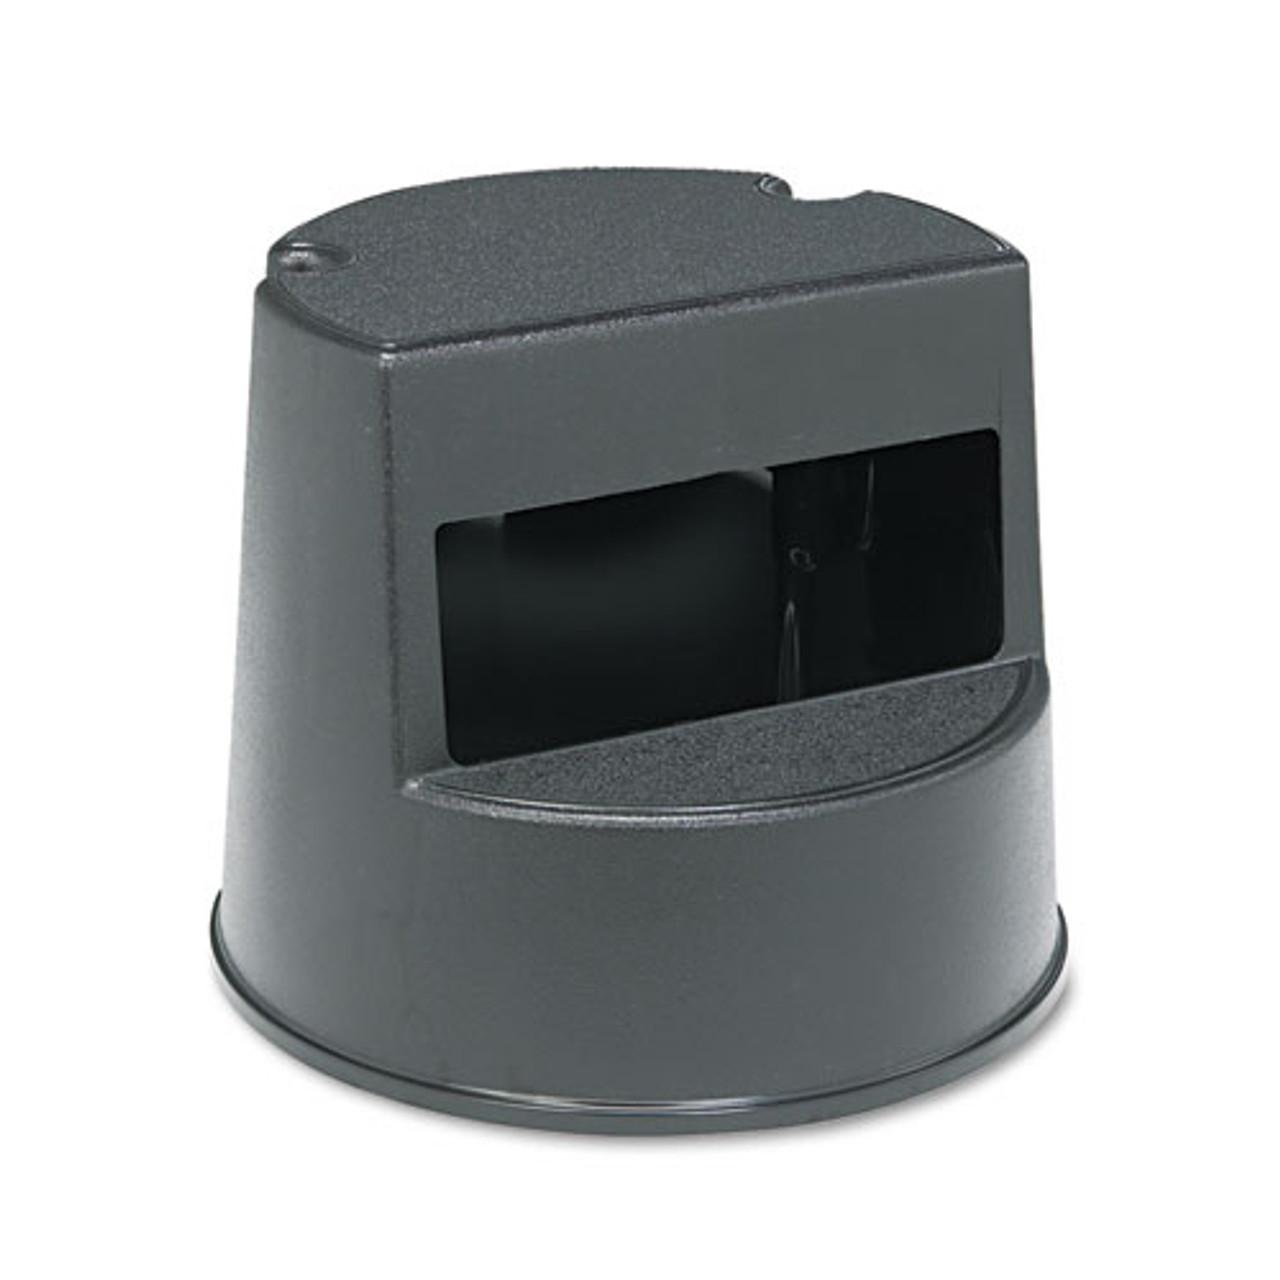 Brilliant Rubbermaid 2523Bla Mobile Two Step Stool Supports Up To 350 Lb Plastic Black Replaces Rcp2523Bla Rcp252300Bk Inzonedesignstudio Interior Chair Design Inzonedesignstudiocom